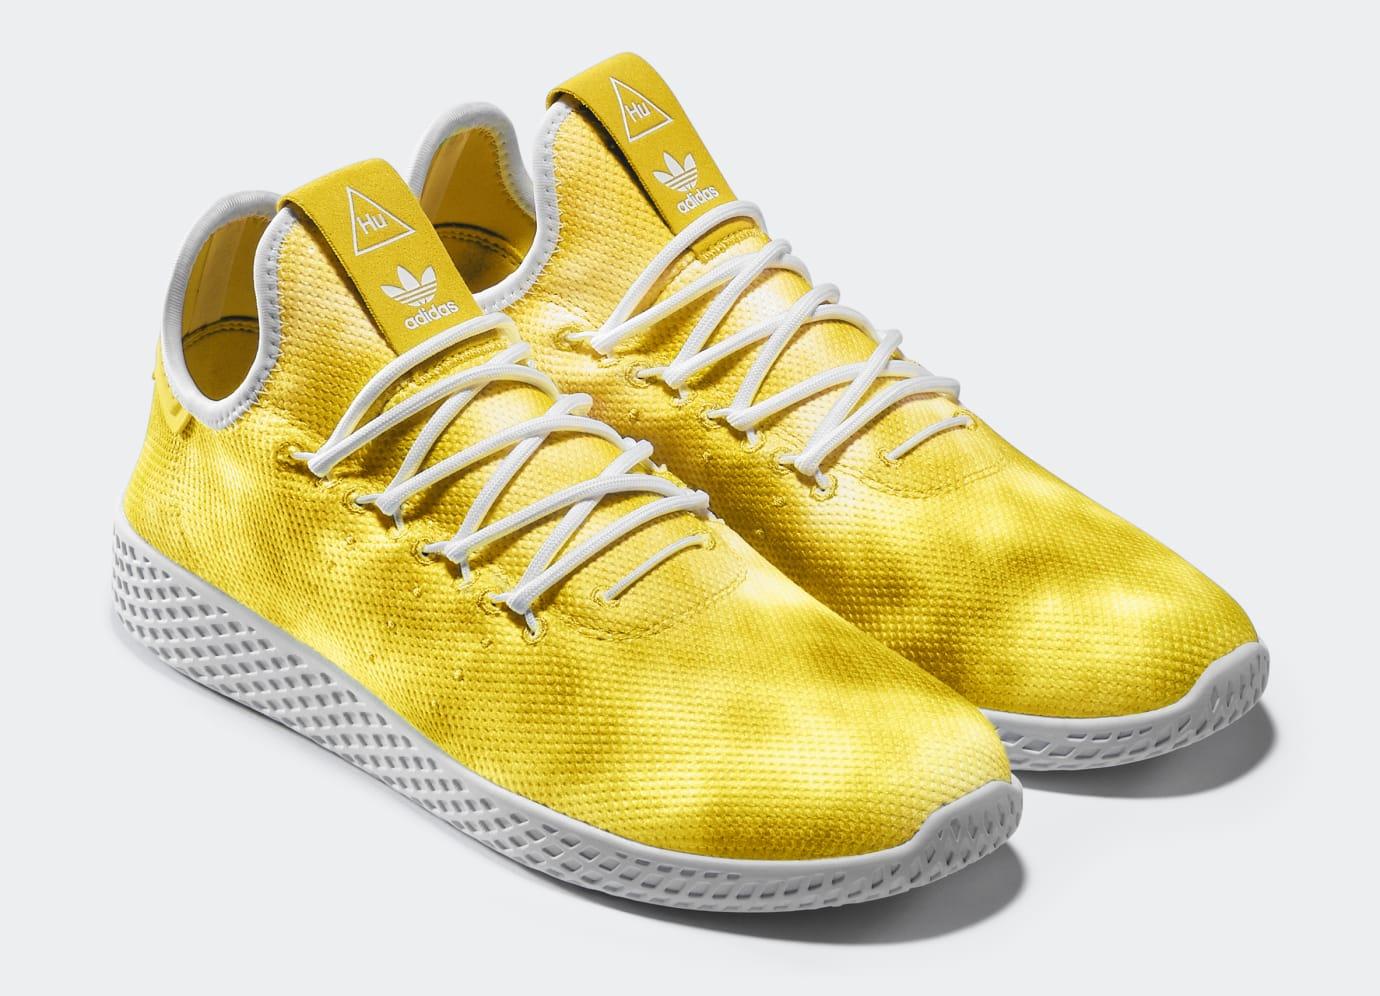 Pharrell x Adidas Tennis HU 'Holi' DA9617 (Pair)